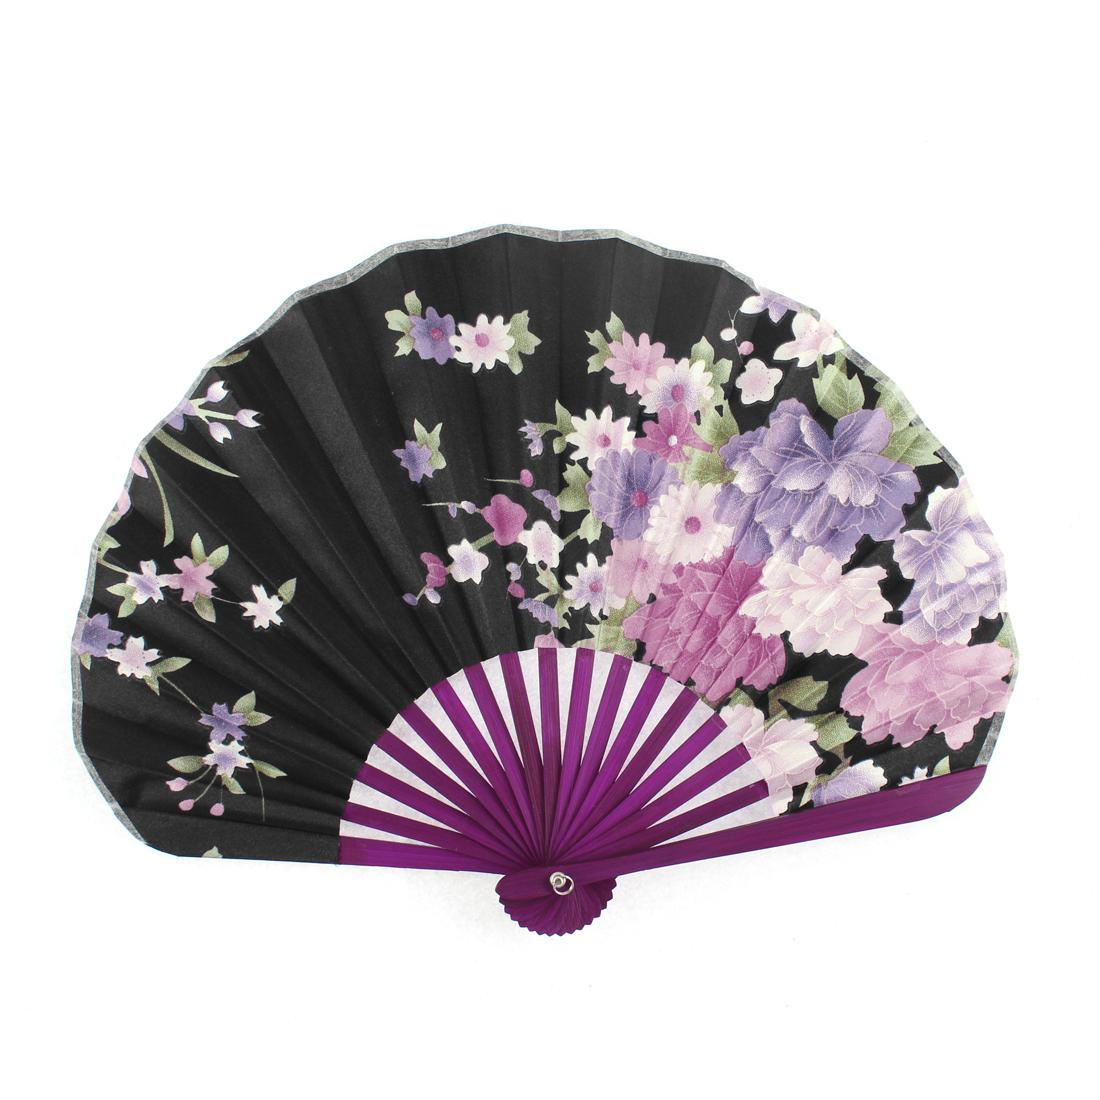 Wood Ribs Seashell Shape Chrysanthemum Pattern Folding Hand Fan Black